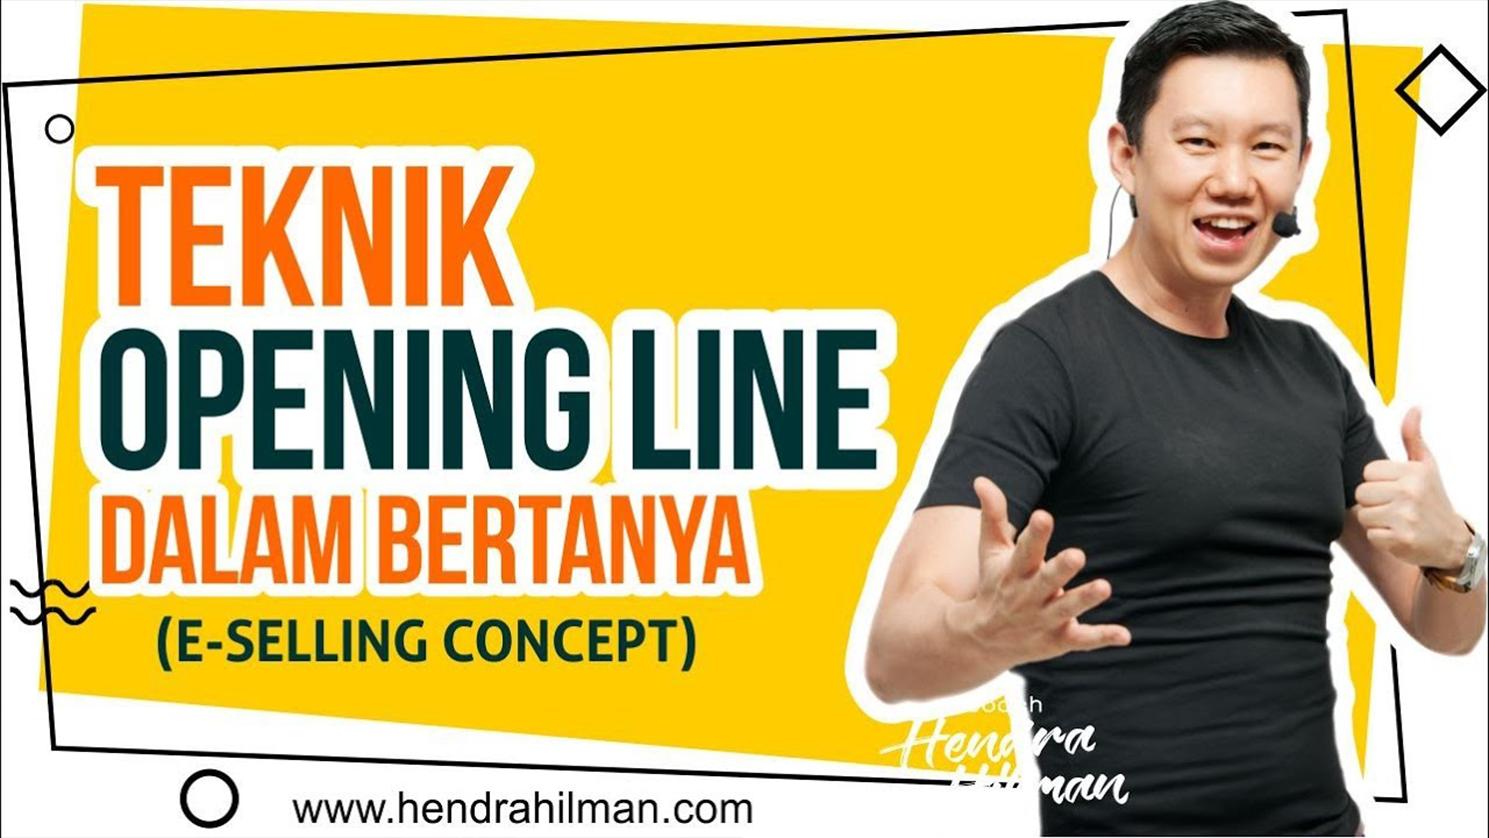 Hendra Hilman Easy #1-2-3 : Teknik Opening Line dalam Bertanya